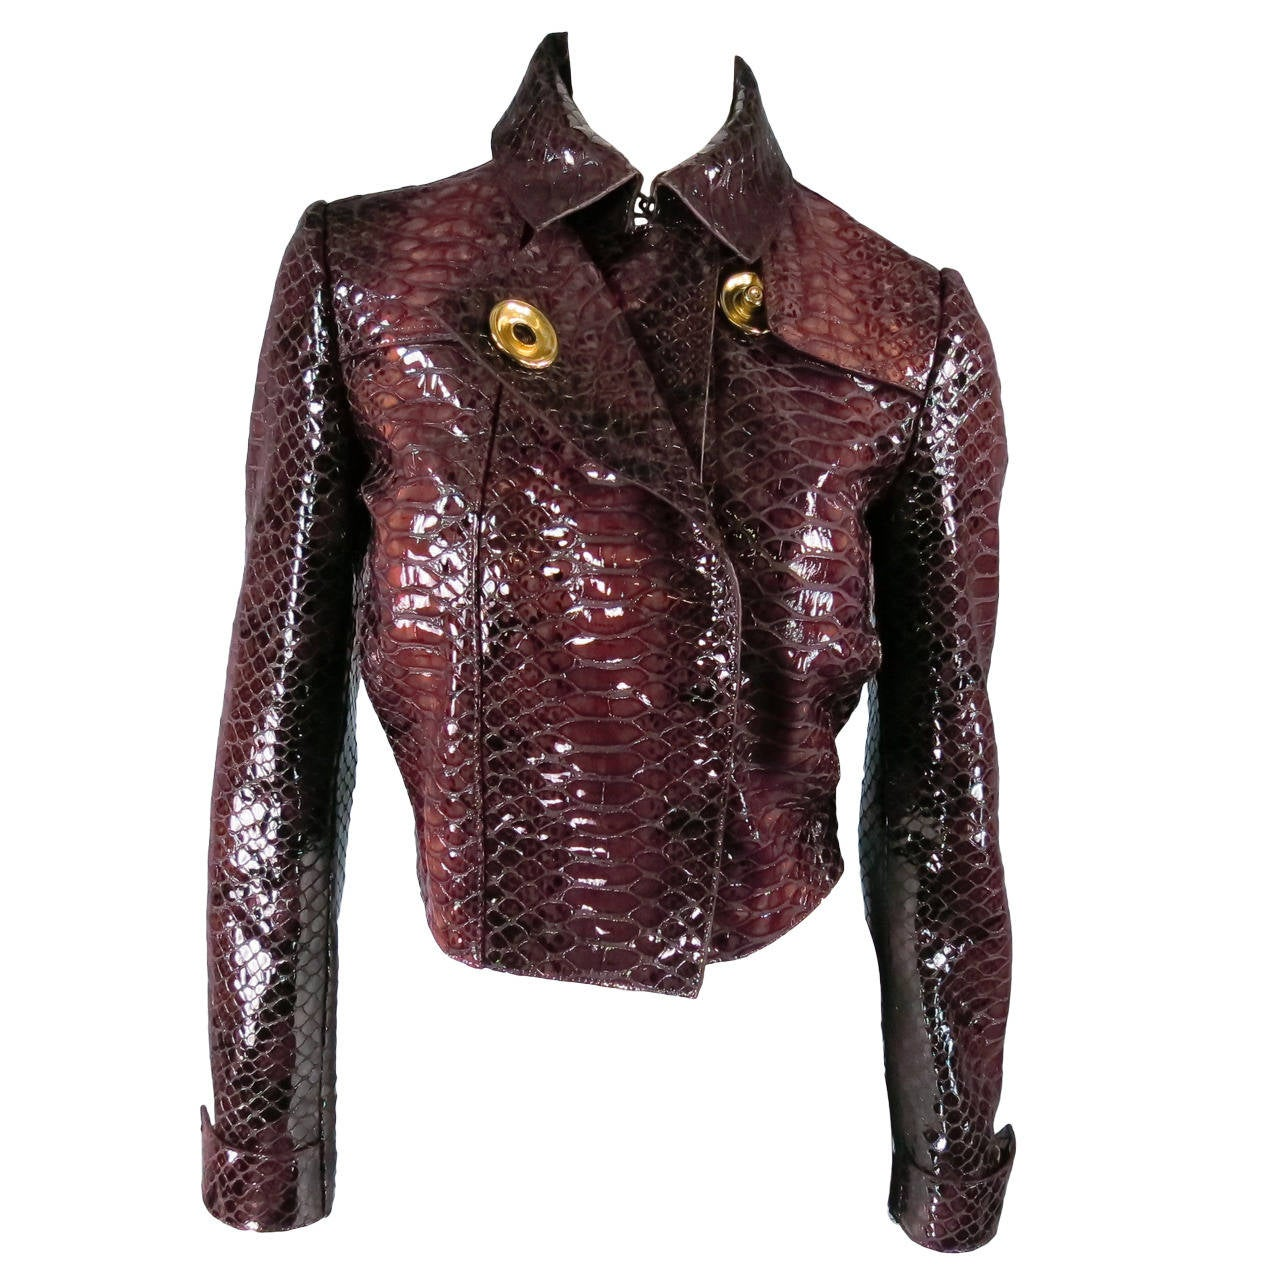 2013's BURBERRY PRORSUM Size 4 Burgundy Python Embossed Patent Leather Jacket 1